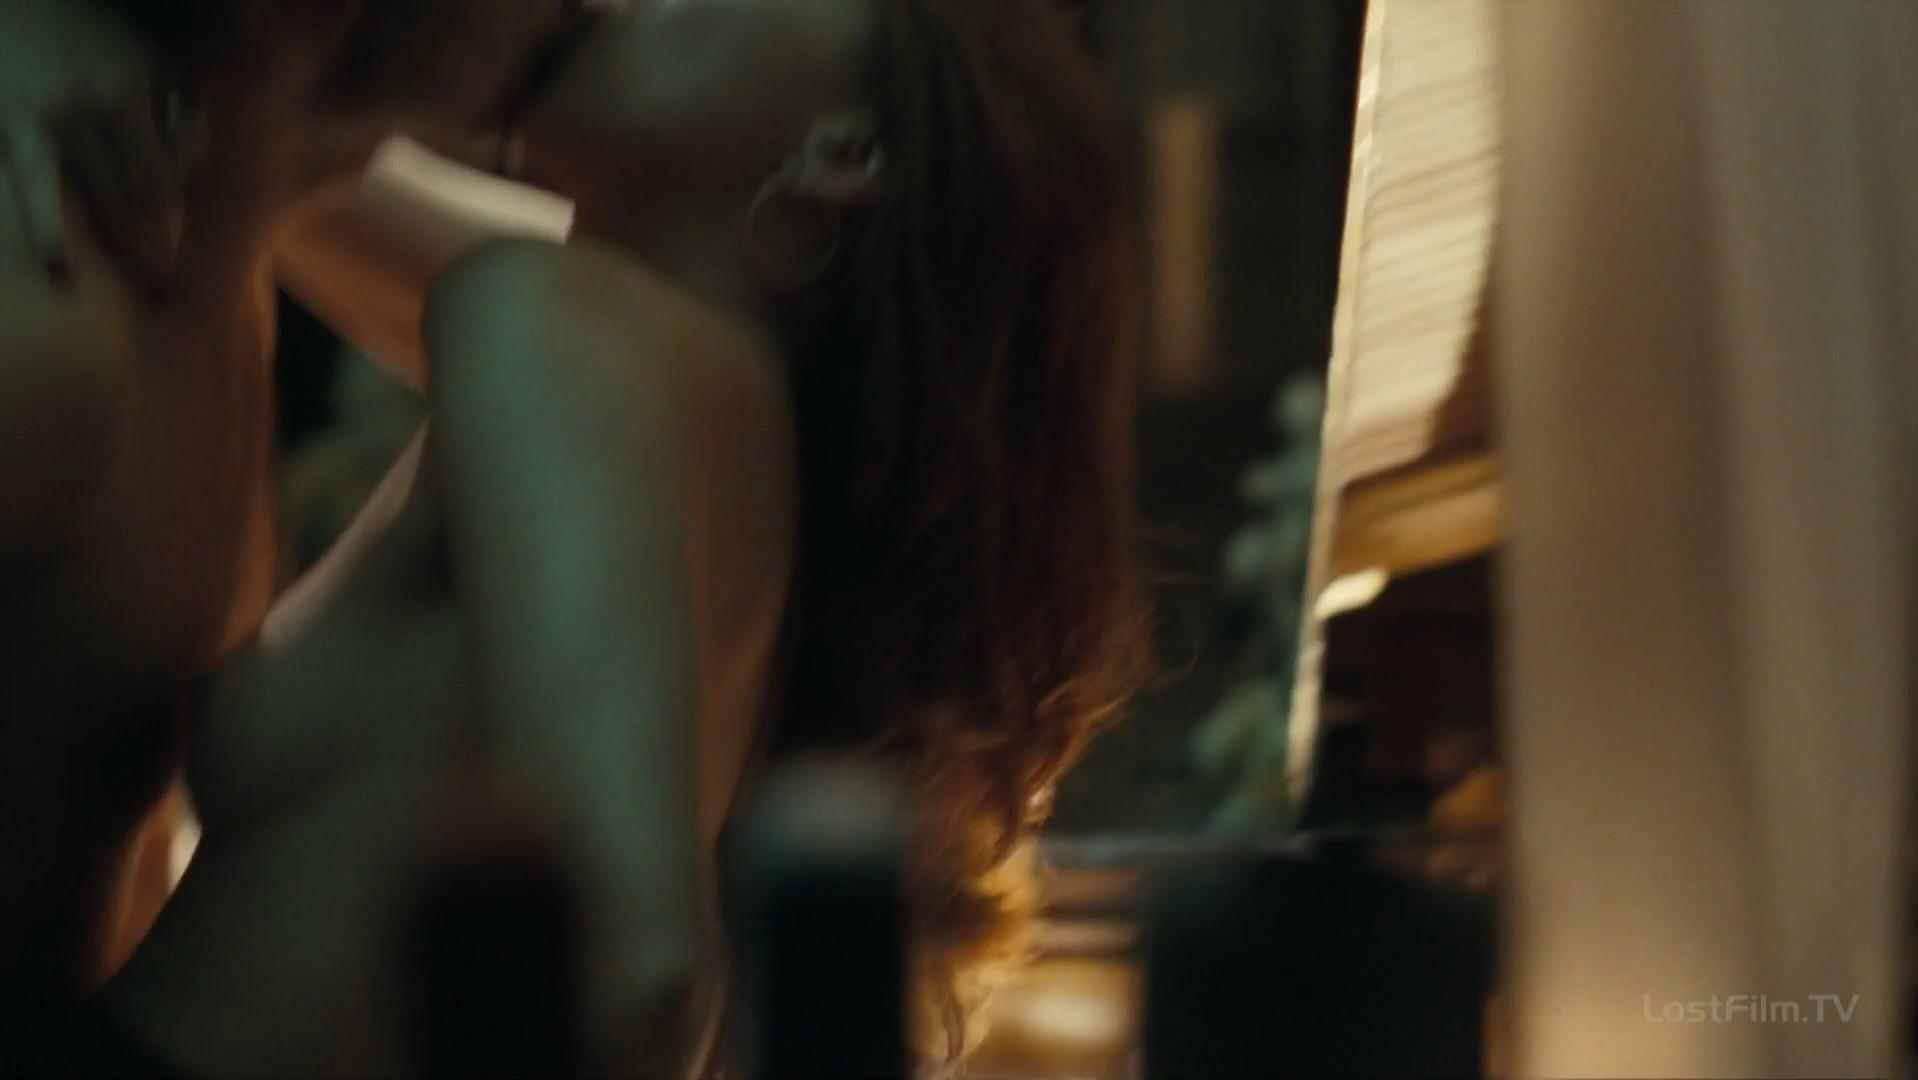 Elizabeth McLaughlin nude - Hand of God s01e01-02 (2014)